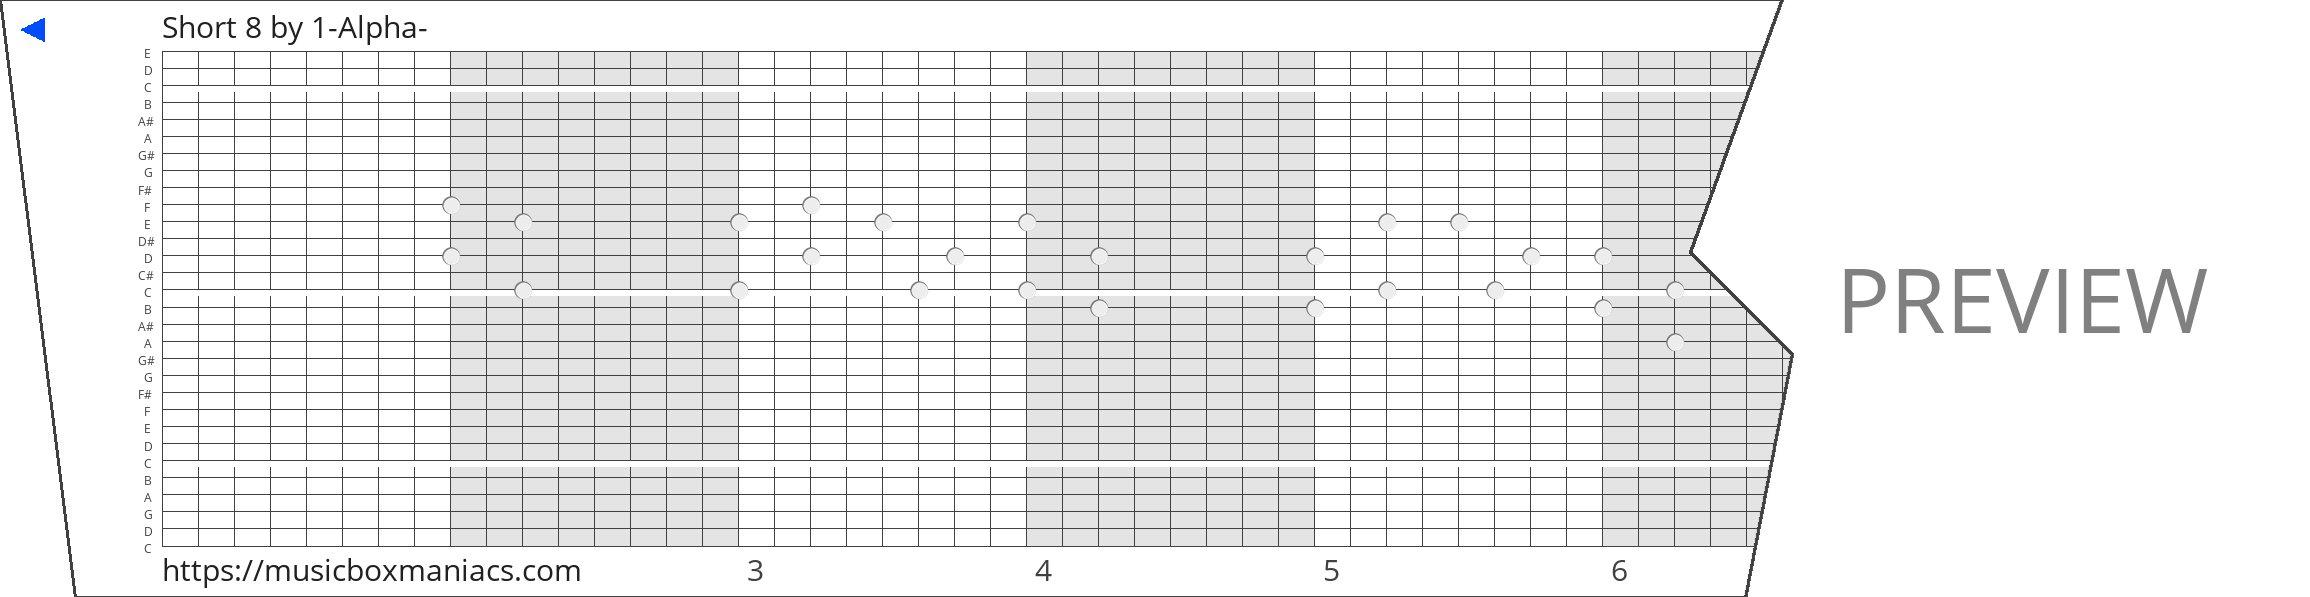 Short 8 30 note music box paper strip